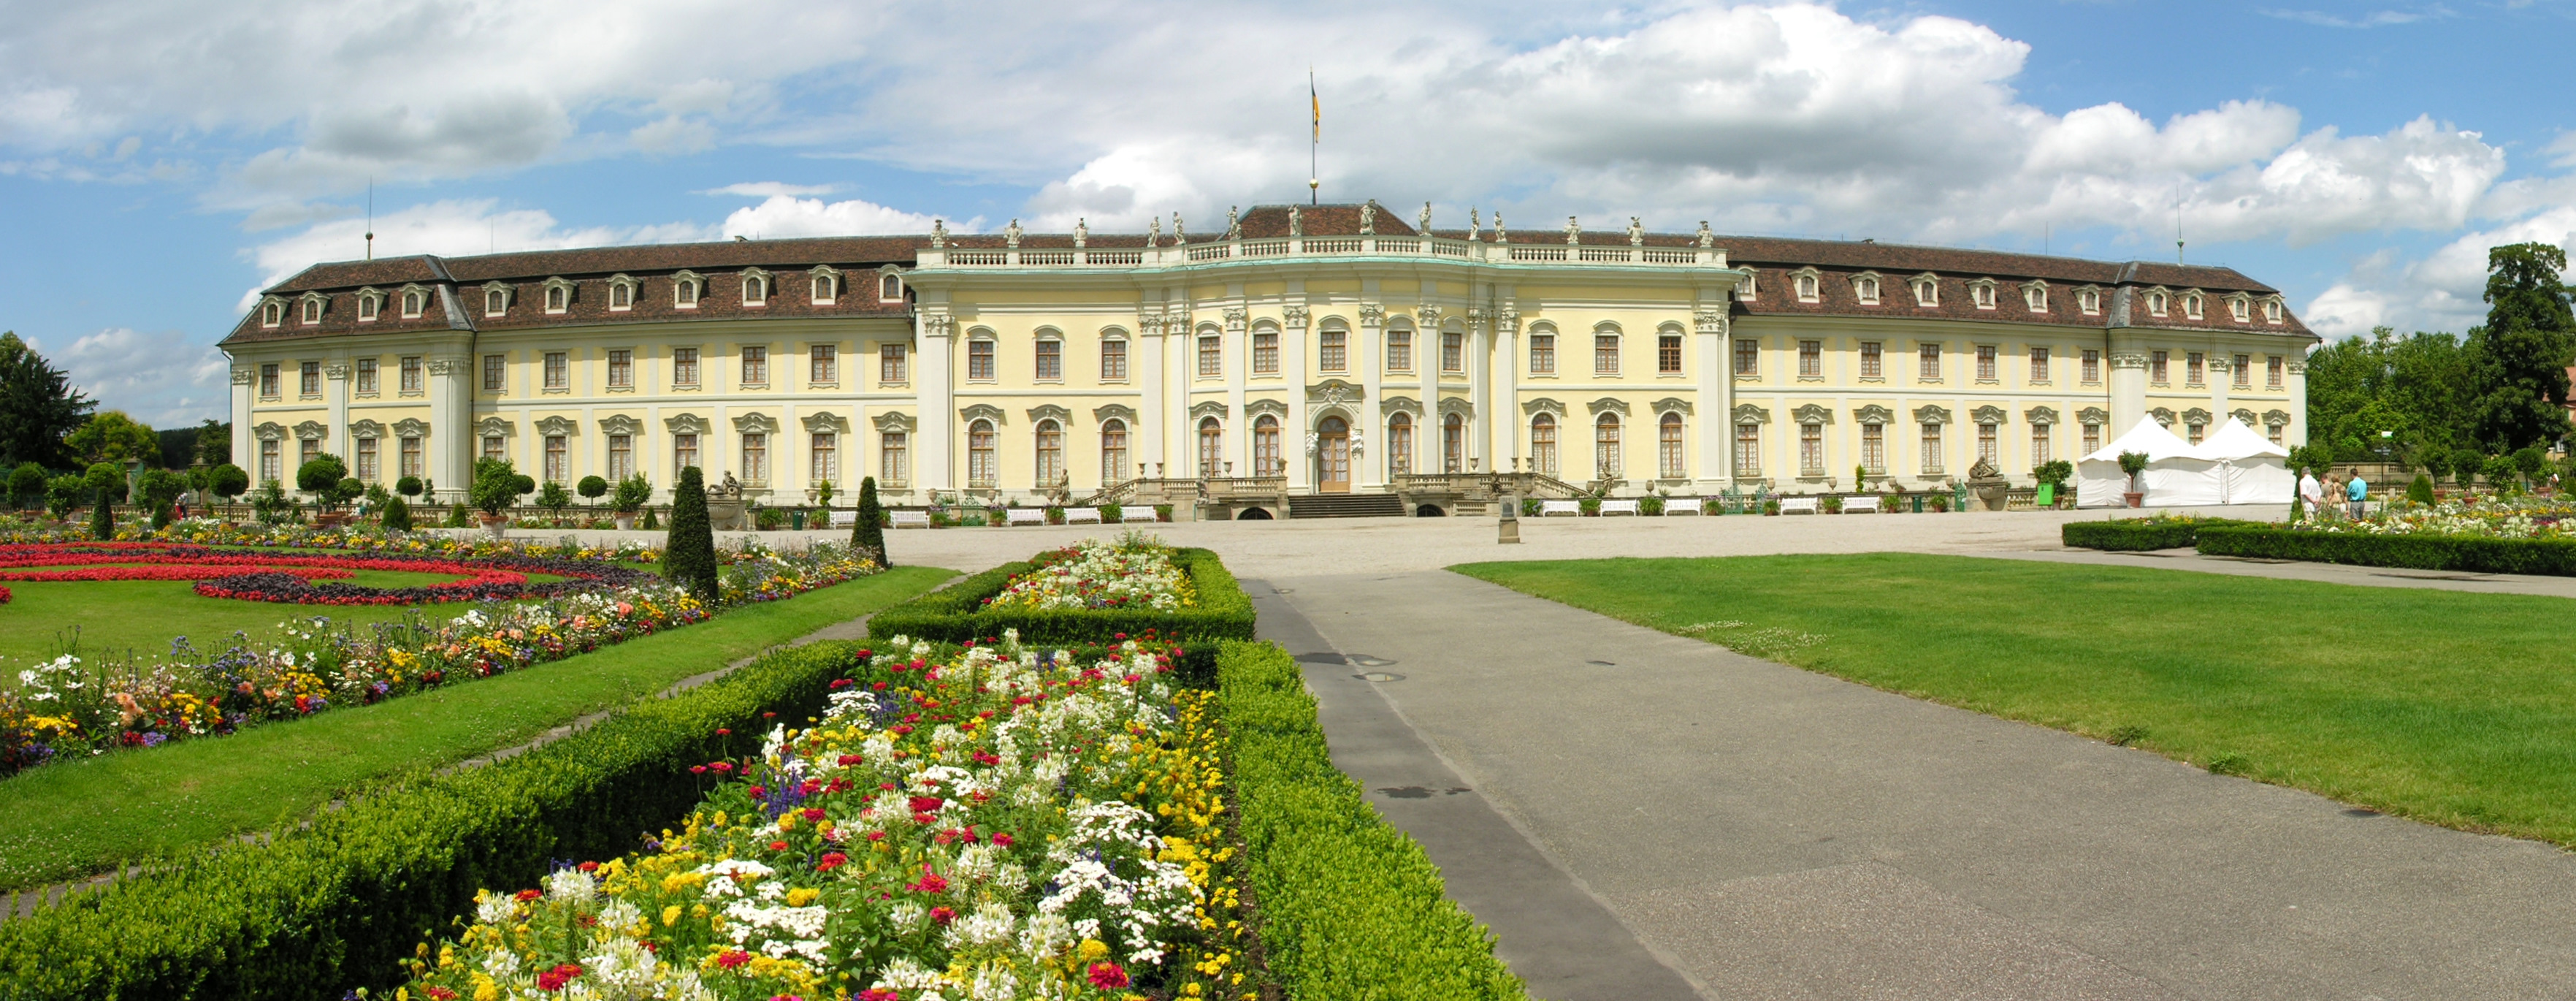 2009-07-13 Schloss Ludwigsburg 10.jpg